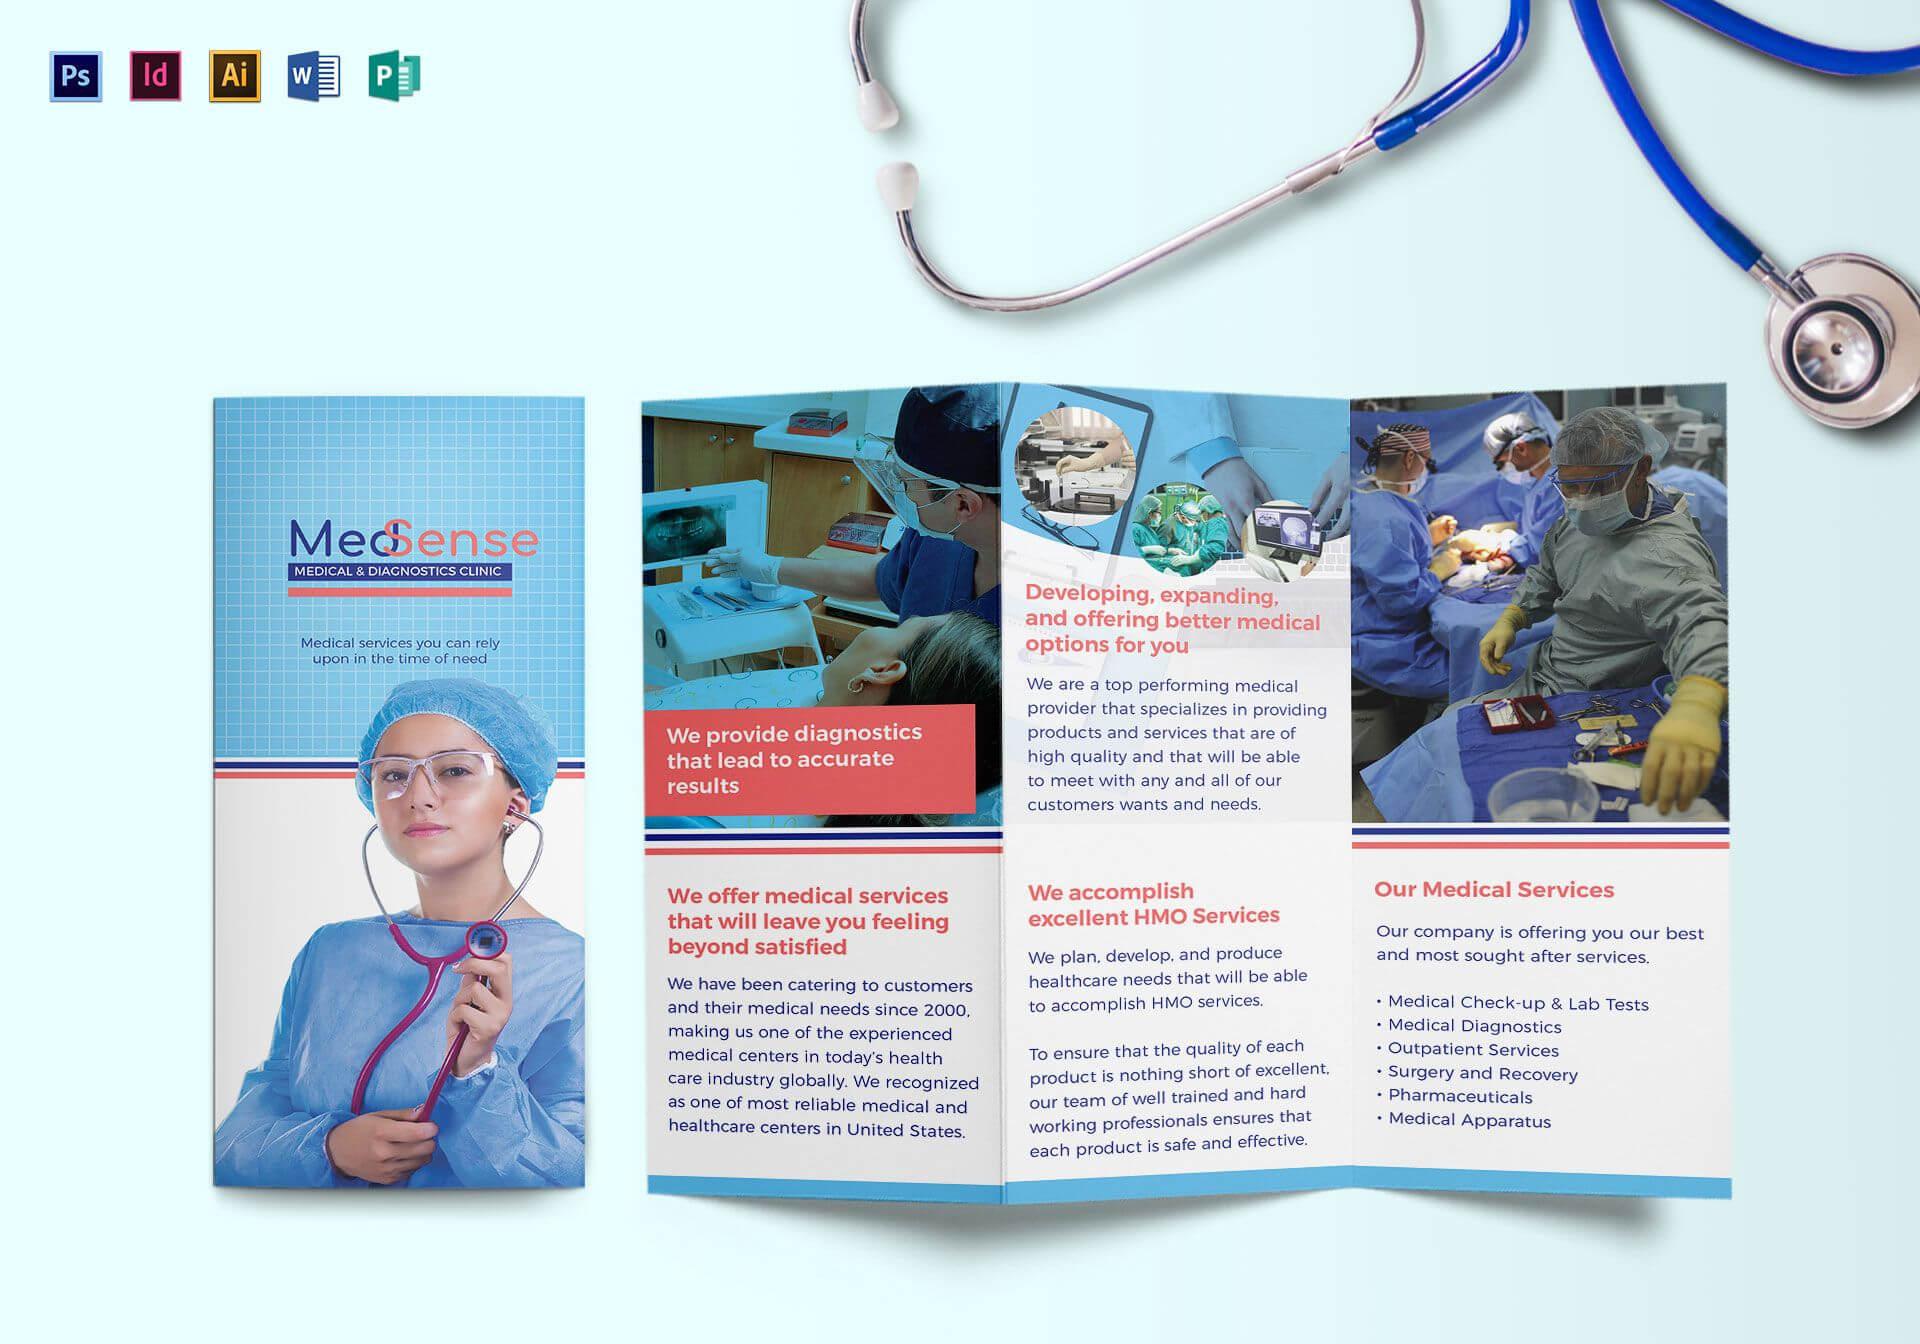 Medical Brocure - Major.magdalene-Project within Medical Office Brochure Templates